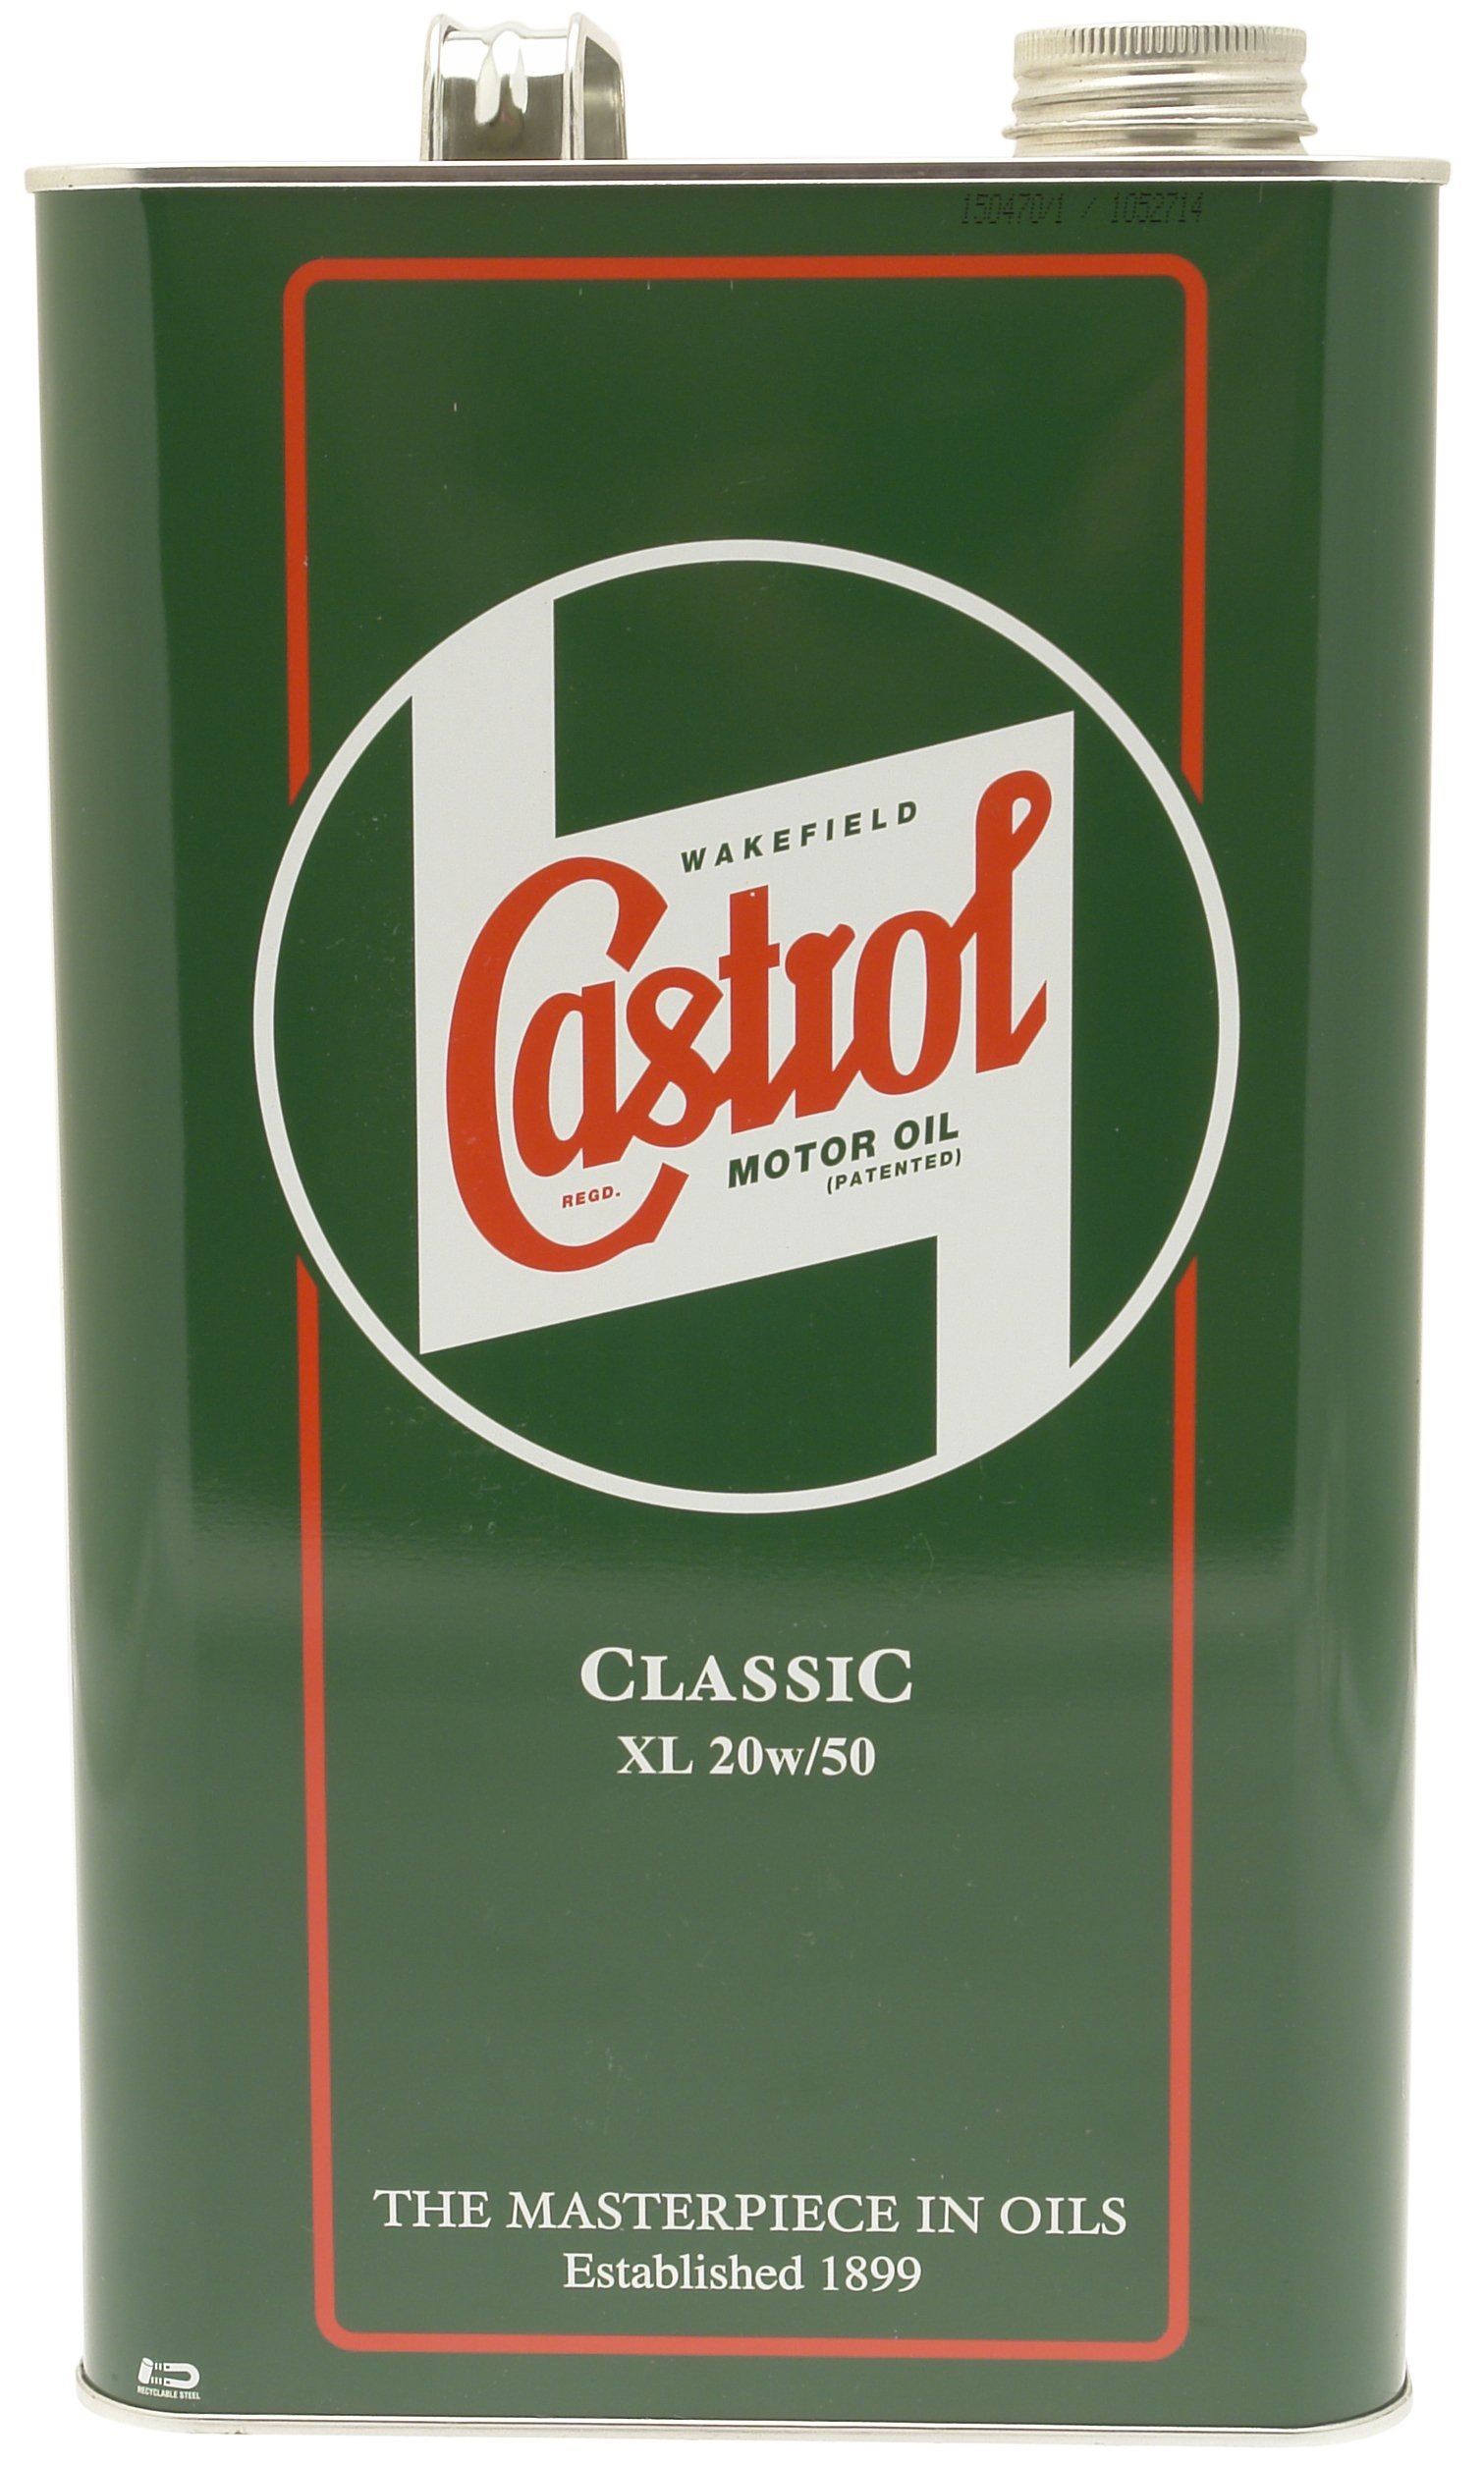 Castrol 1925A Classic 20W50 Oil, 4.54 Liter